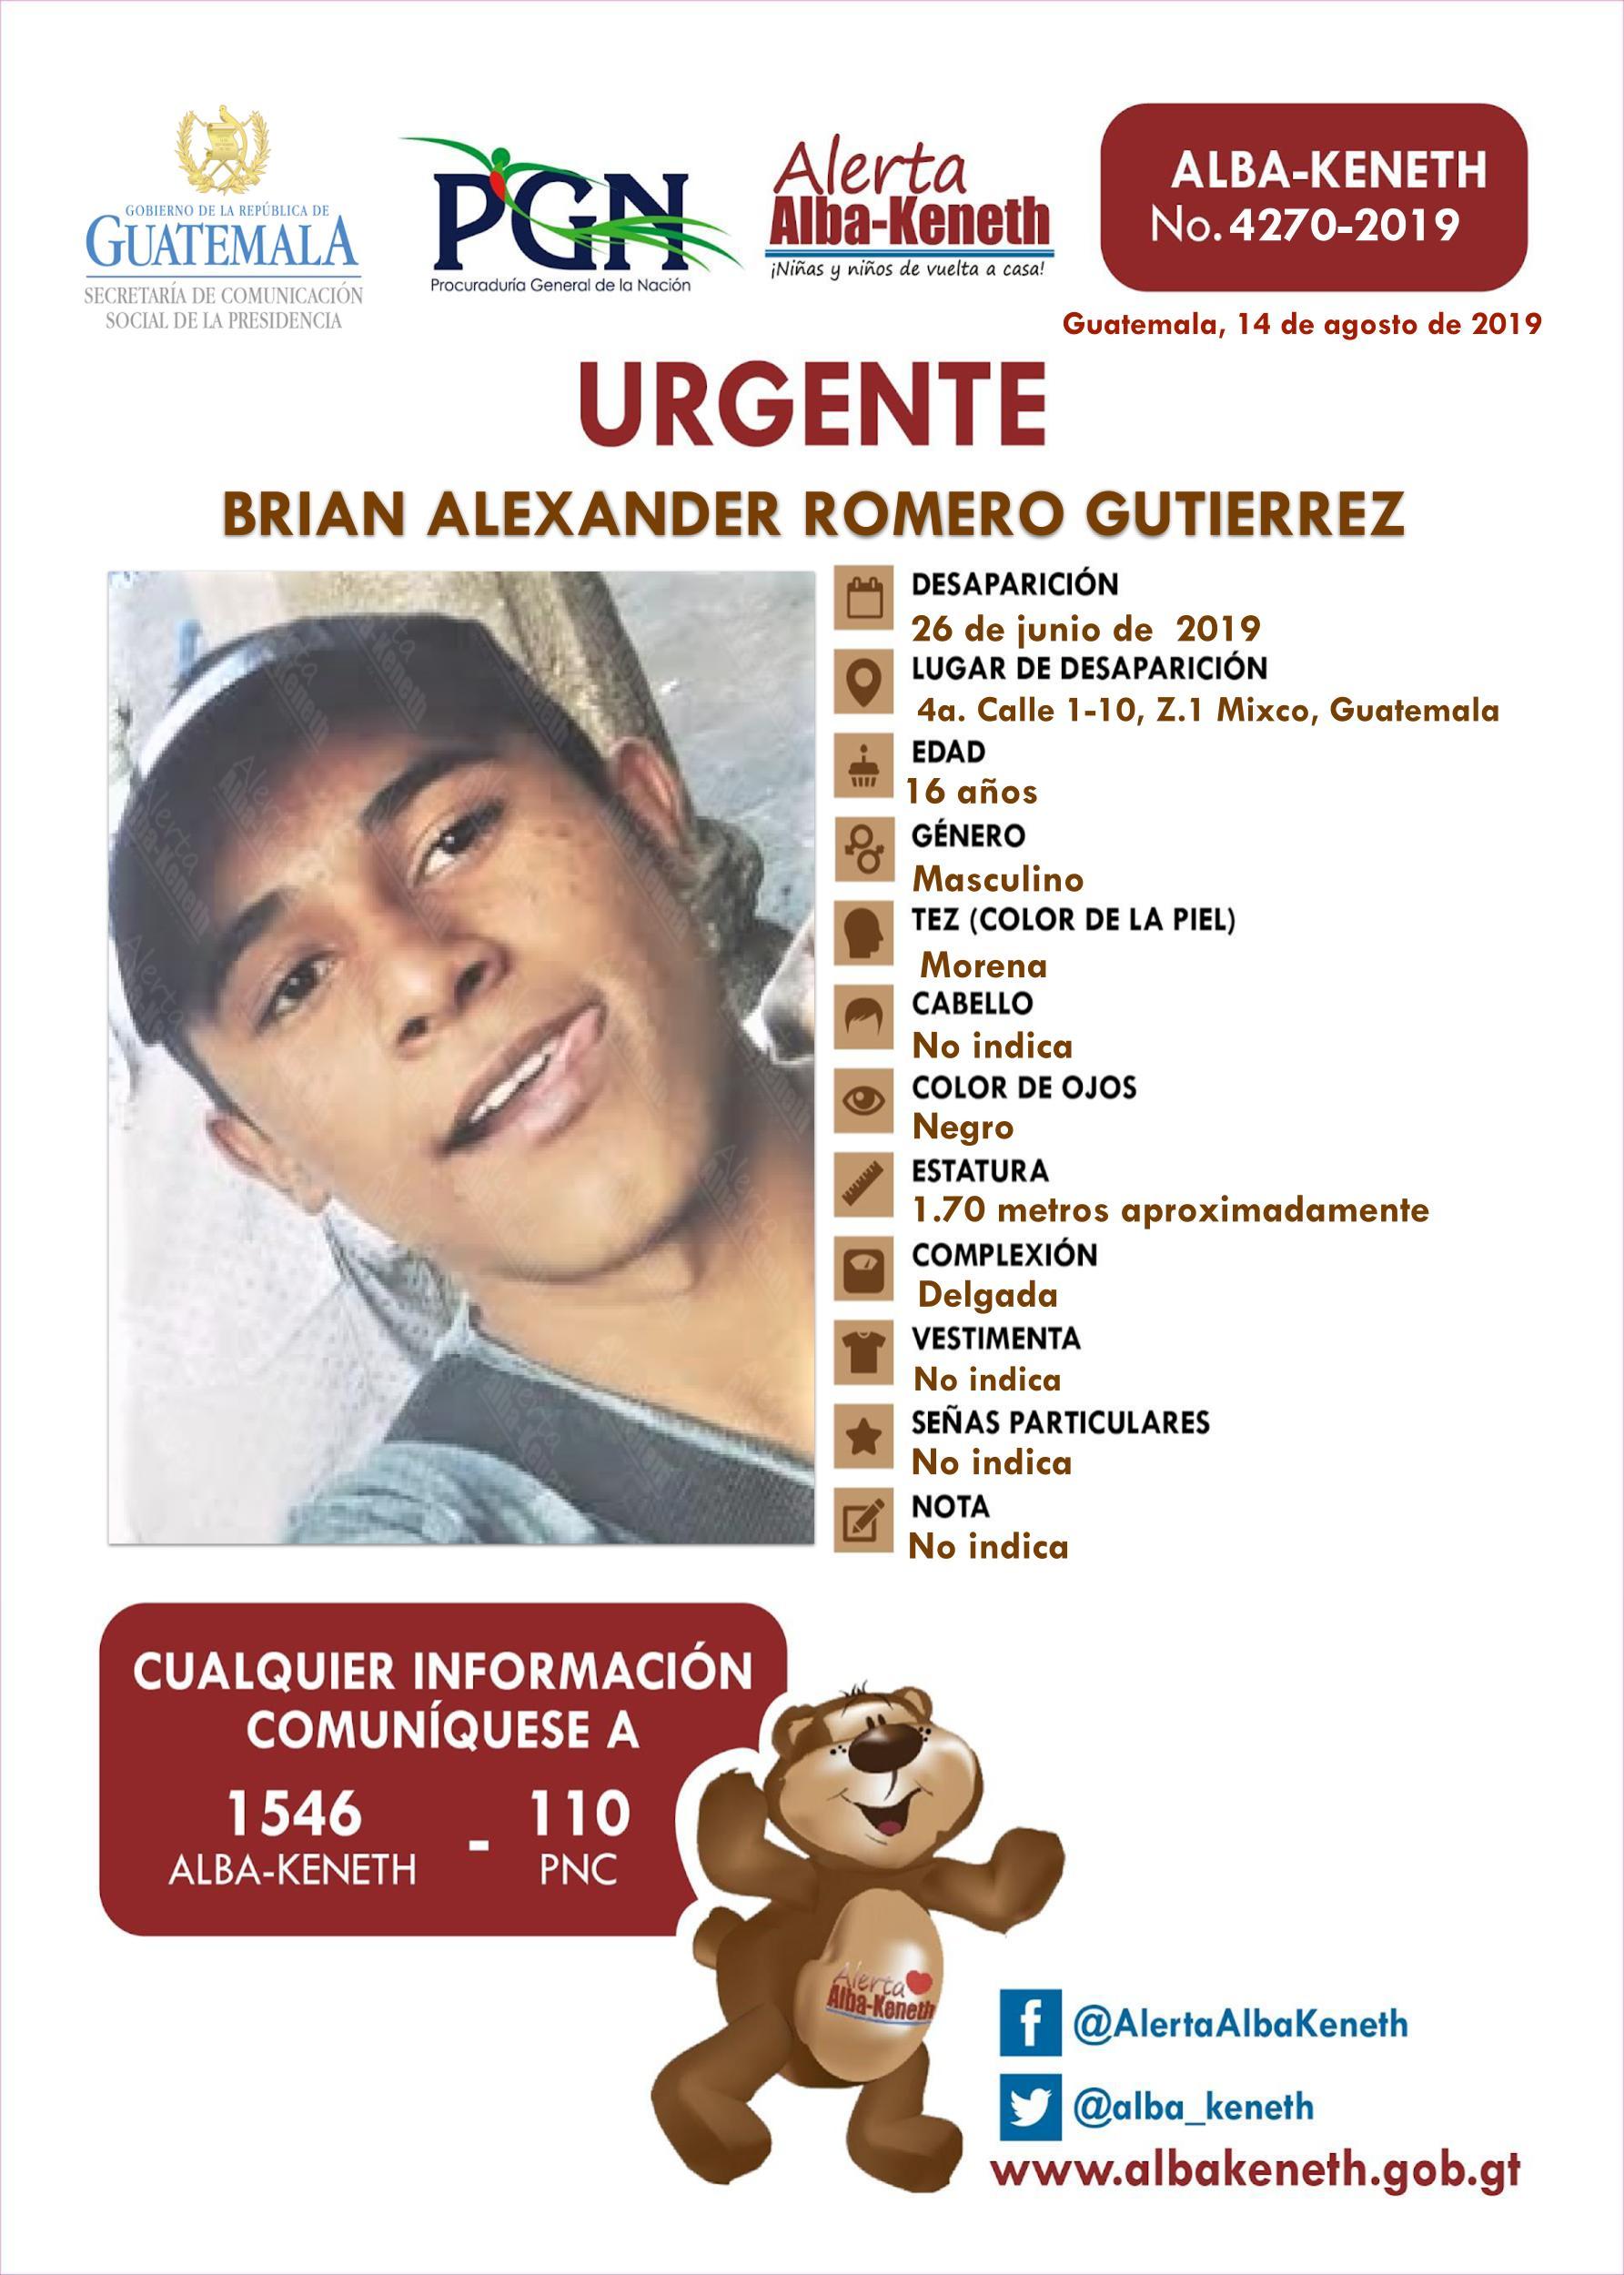 Brian Alexander Romero Gutierrez